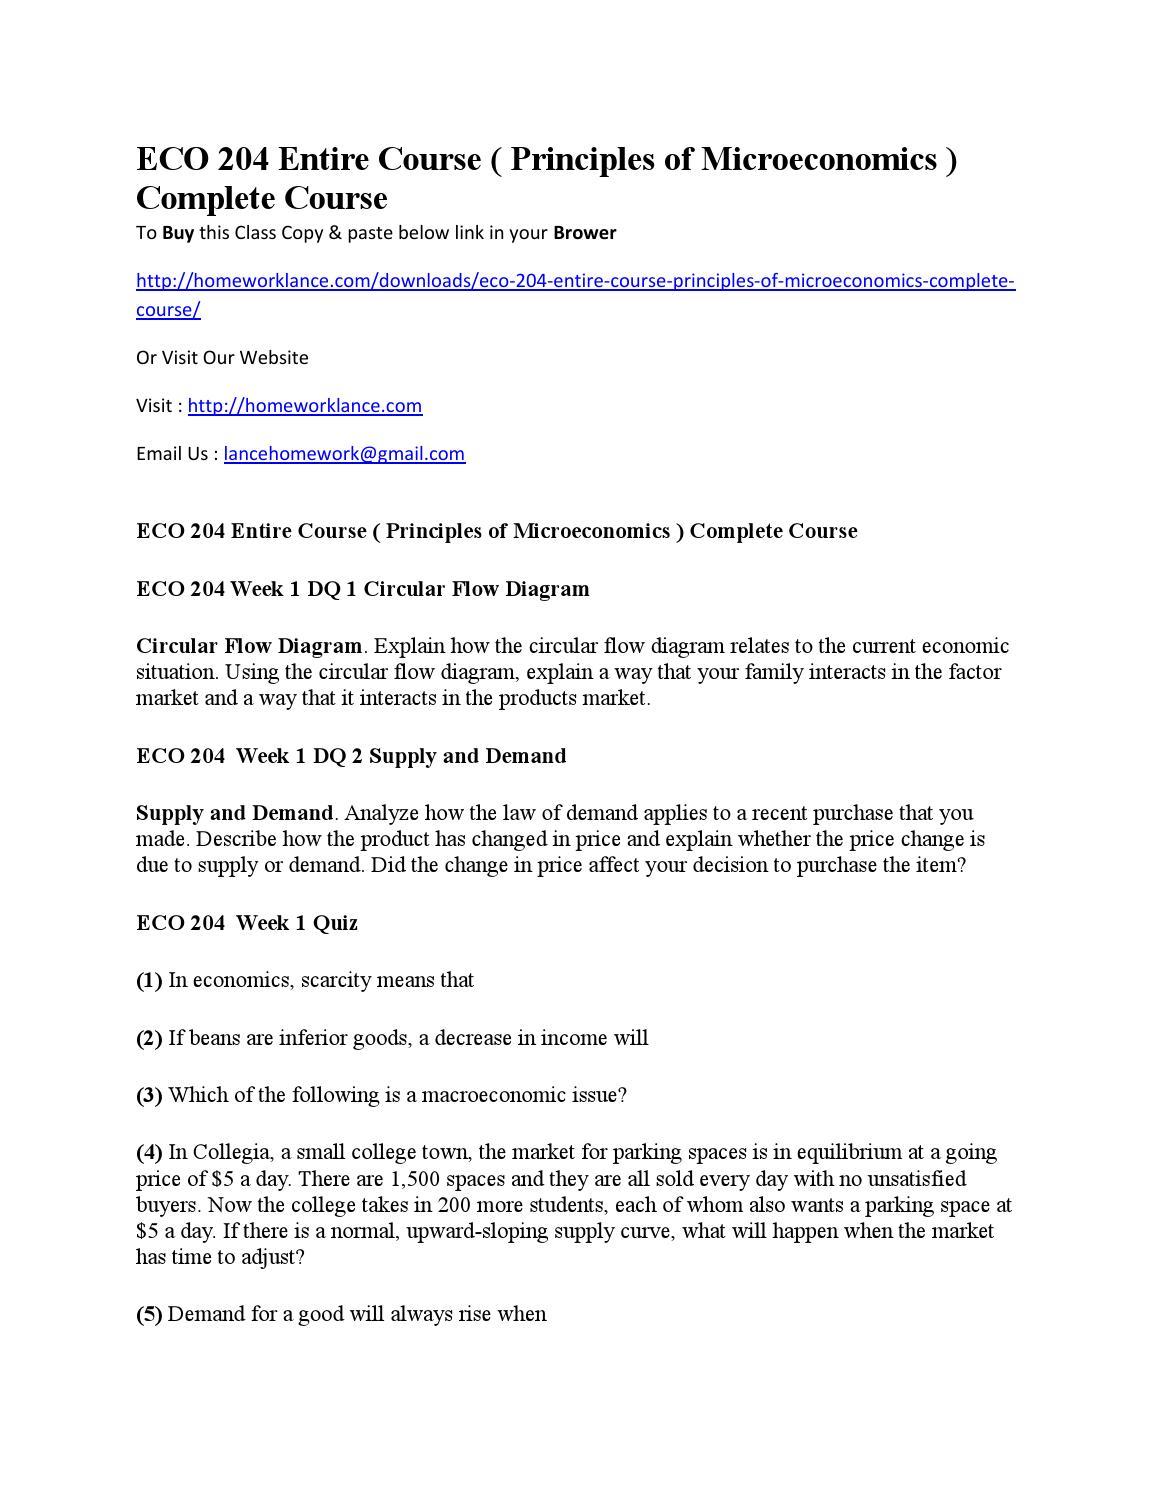 Eco 204 Entire Course Principles Of Microeconomics Complete